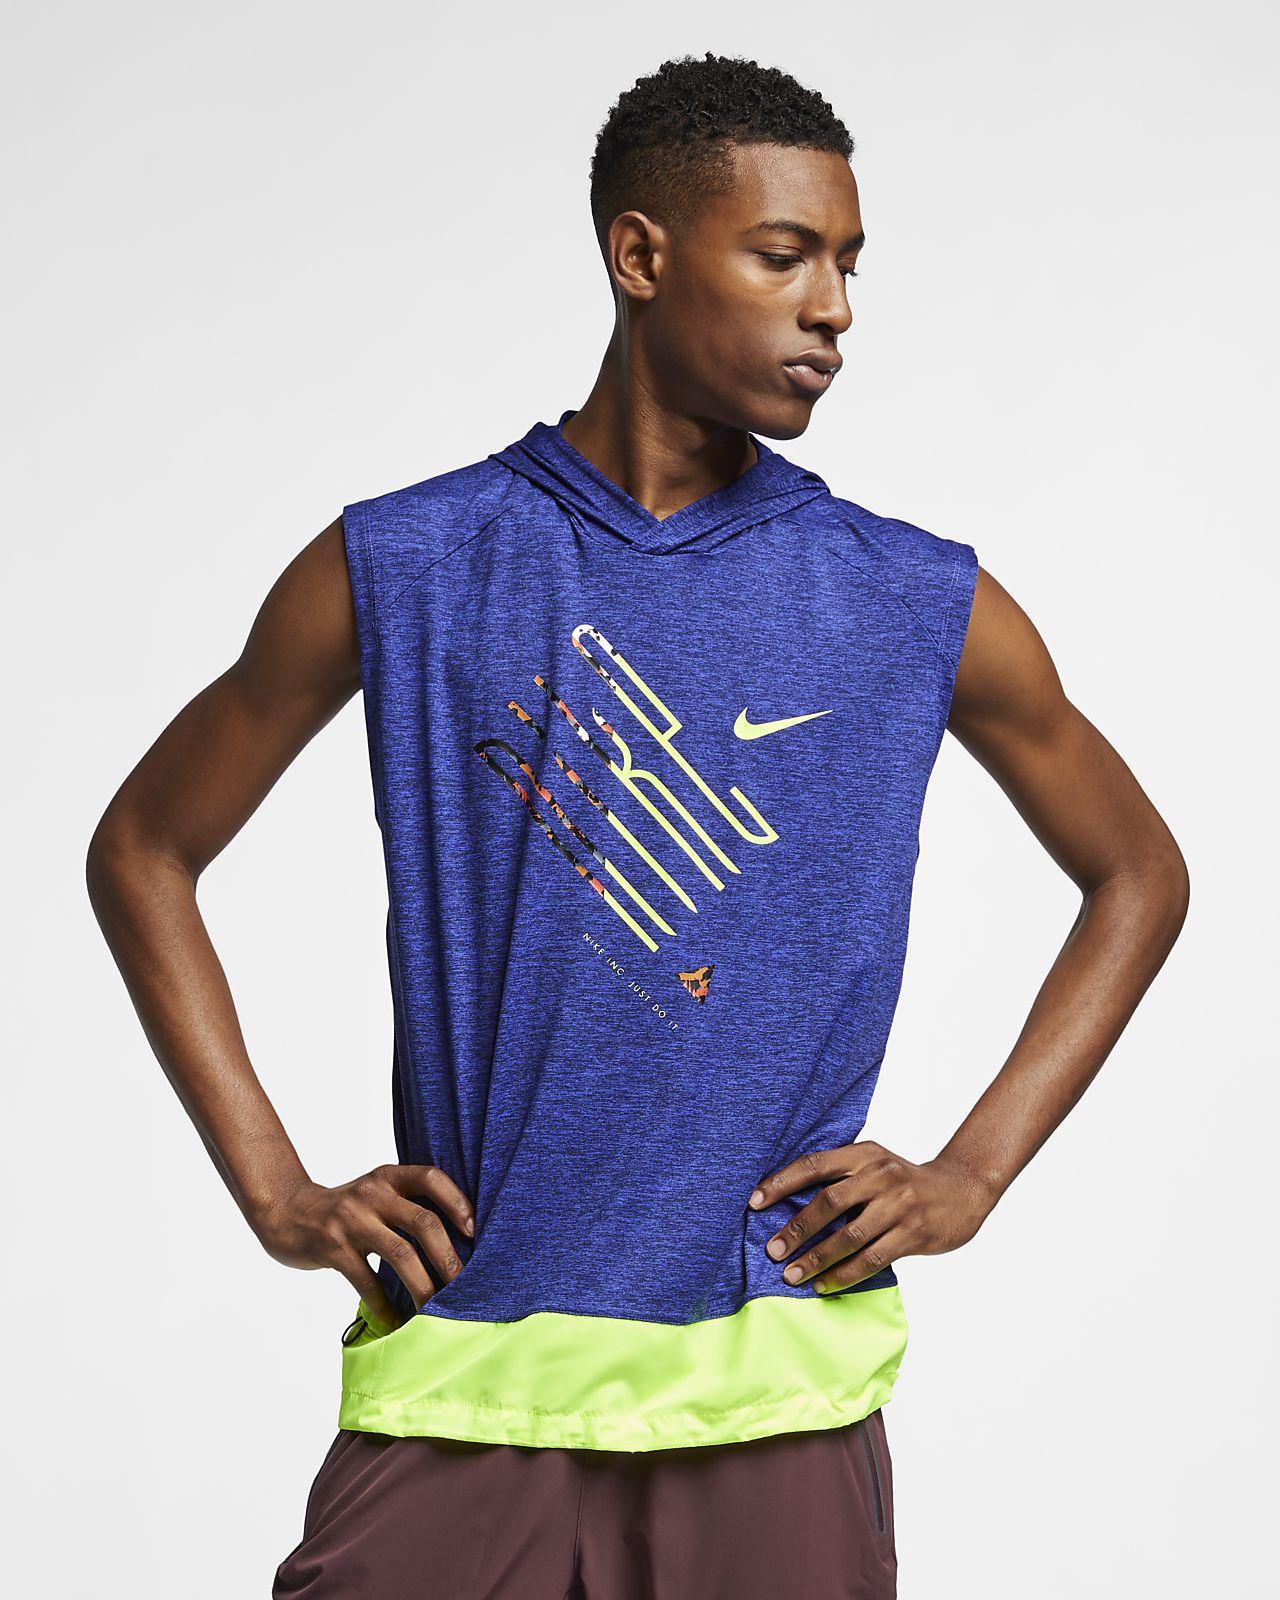 5872a385f20c Nike Sleeveless Shirts Mens - DREAMWORKS